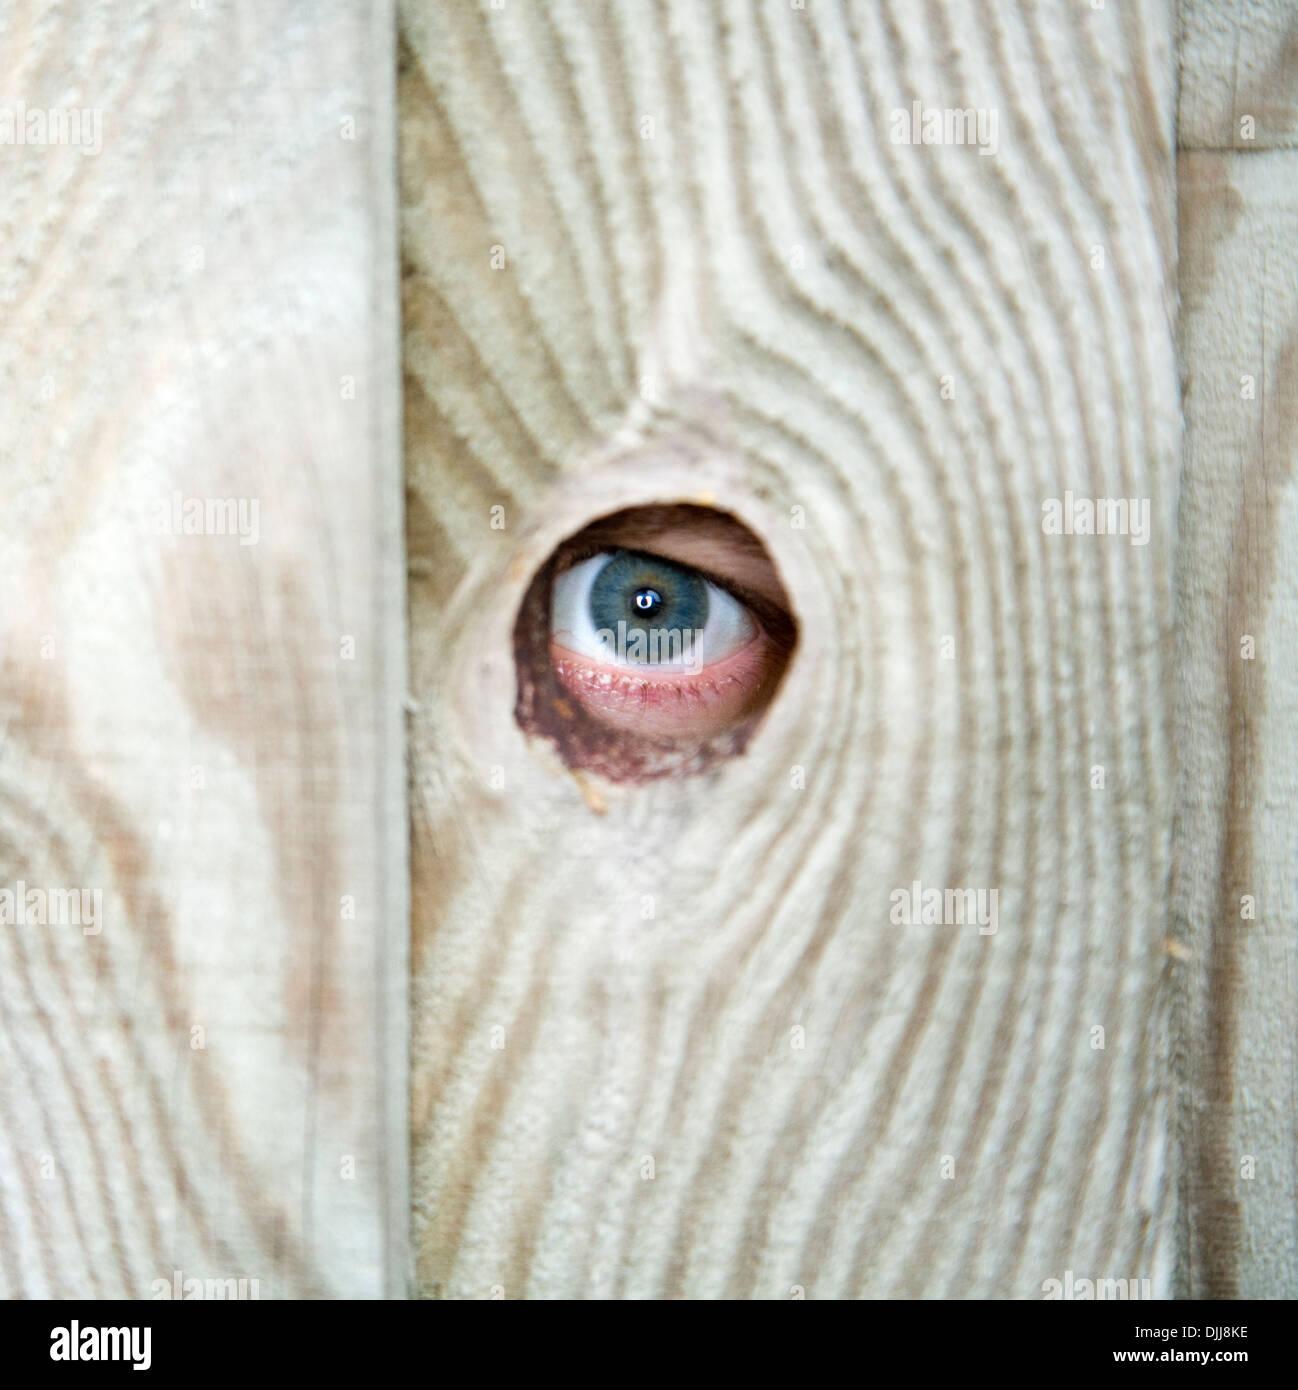 neighbor peeping